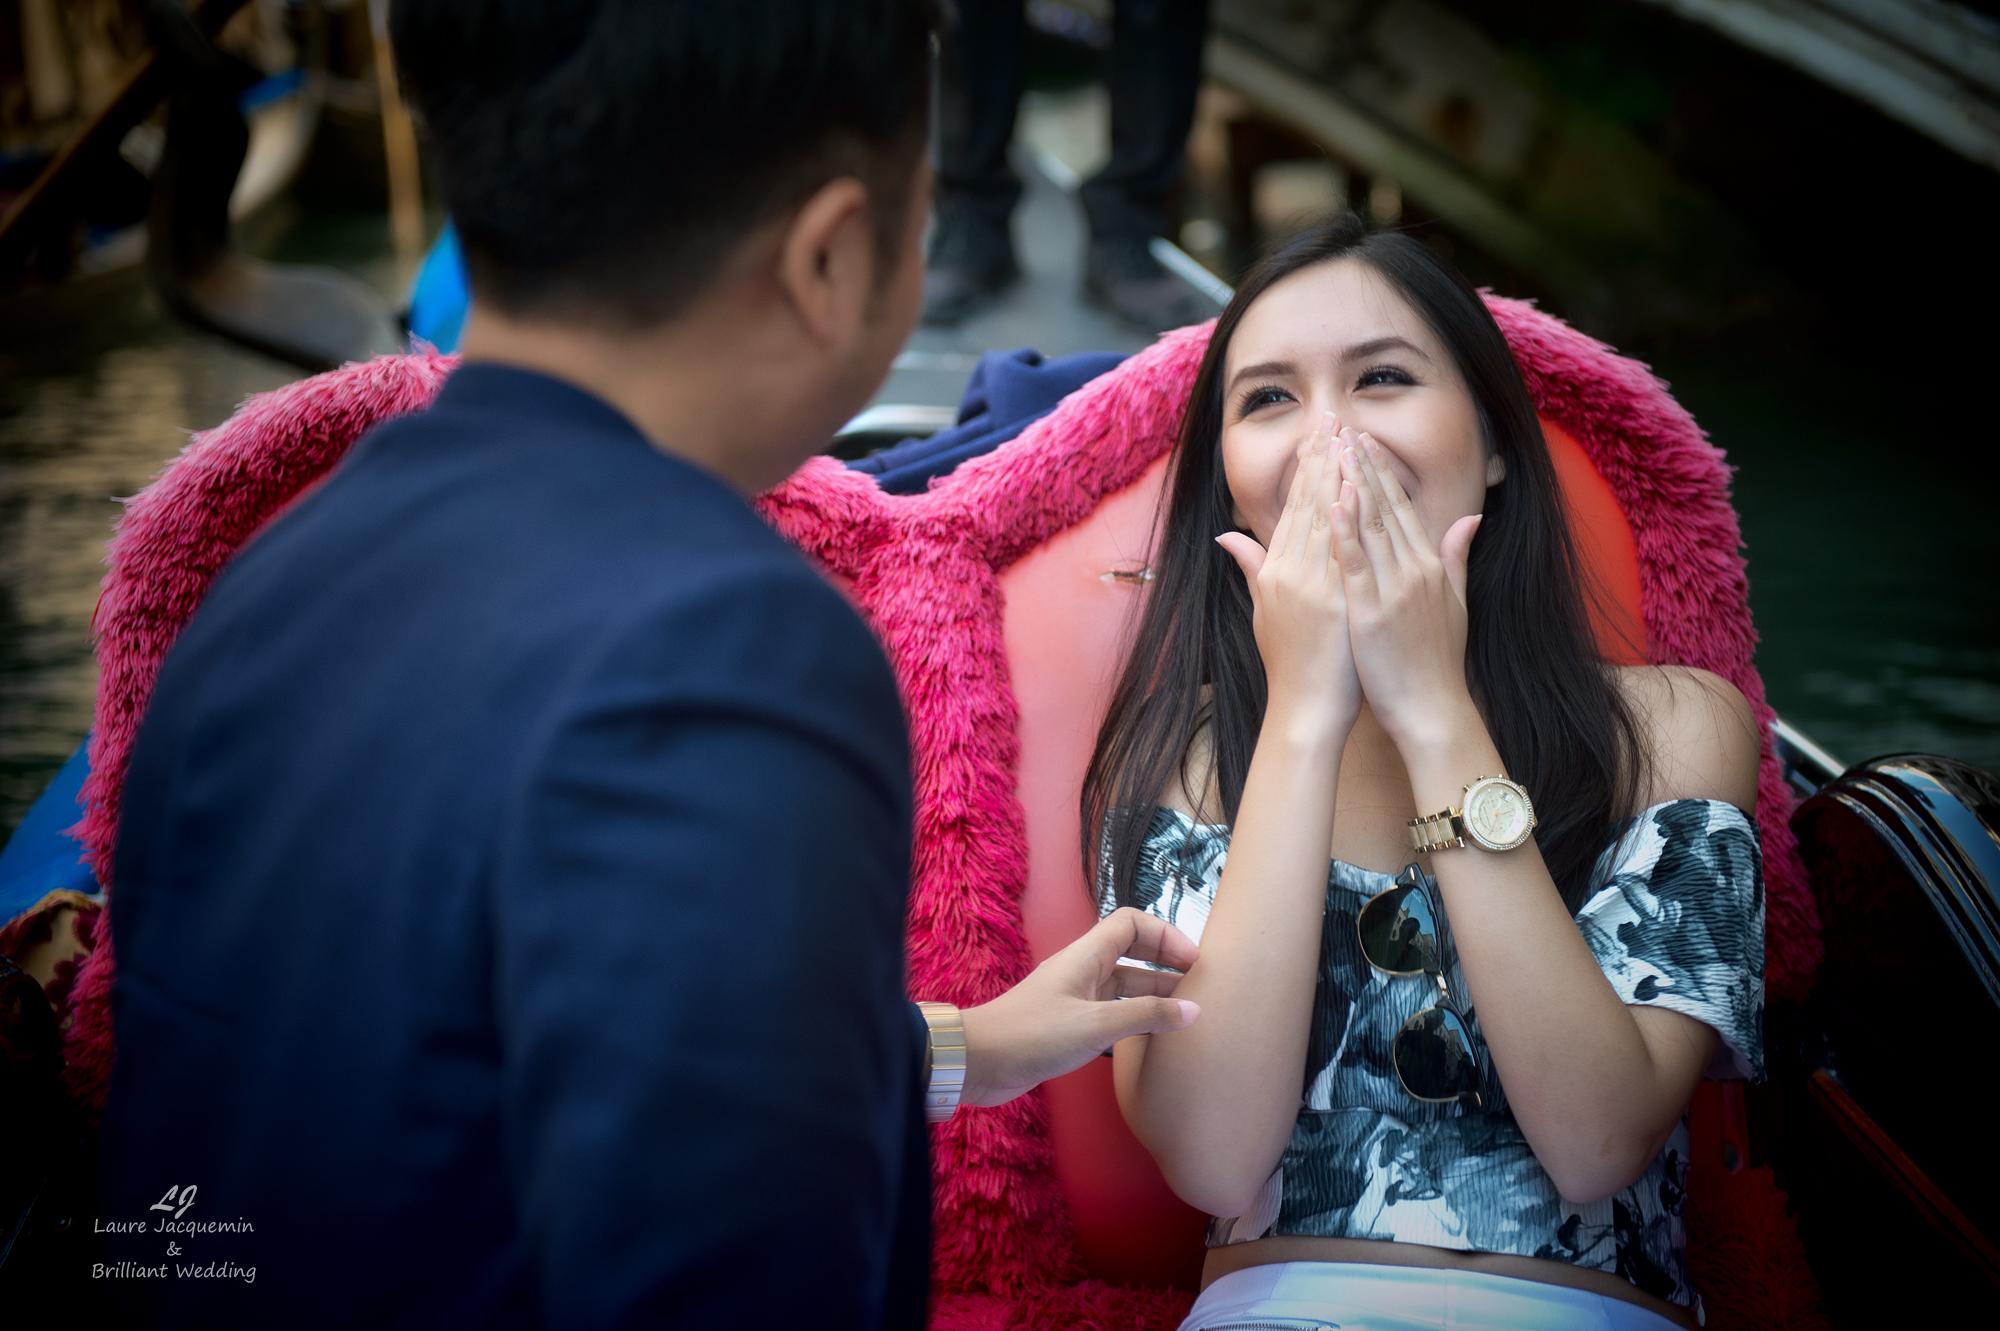 Venezia fotografo proposta matrimonio laure jacquemin (40) copia